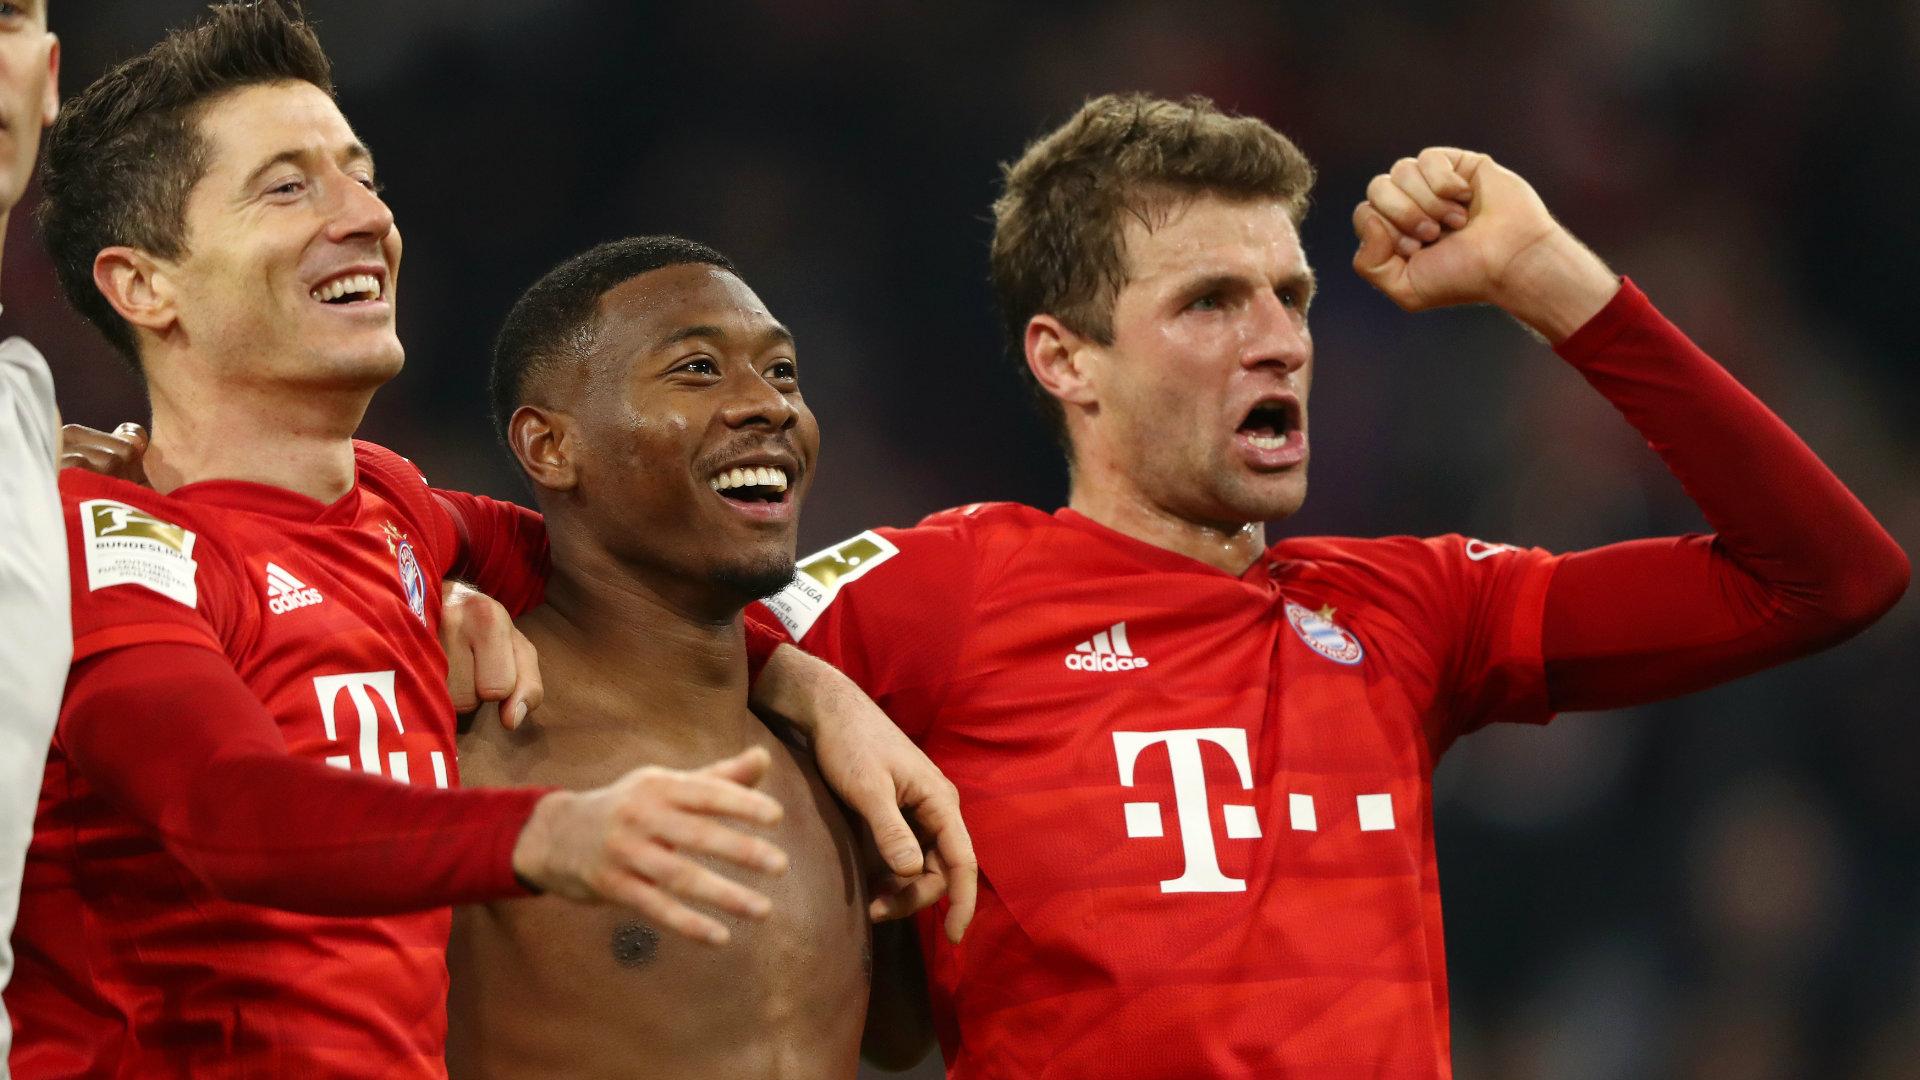 robert lewandowski thomas muller bayern munich vs borussia dortmund 2019 20 1b4mwrtn7q28r1a1lja7vyws9f - Bundesliga: Lewandowski strikes again as Bayern Munich outclass Borussia Dortmund